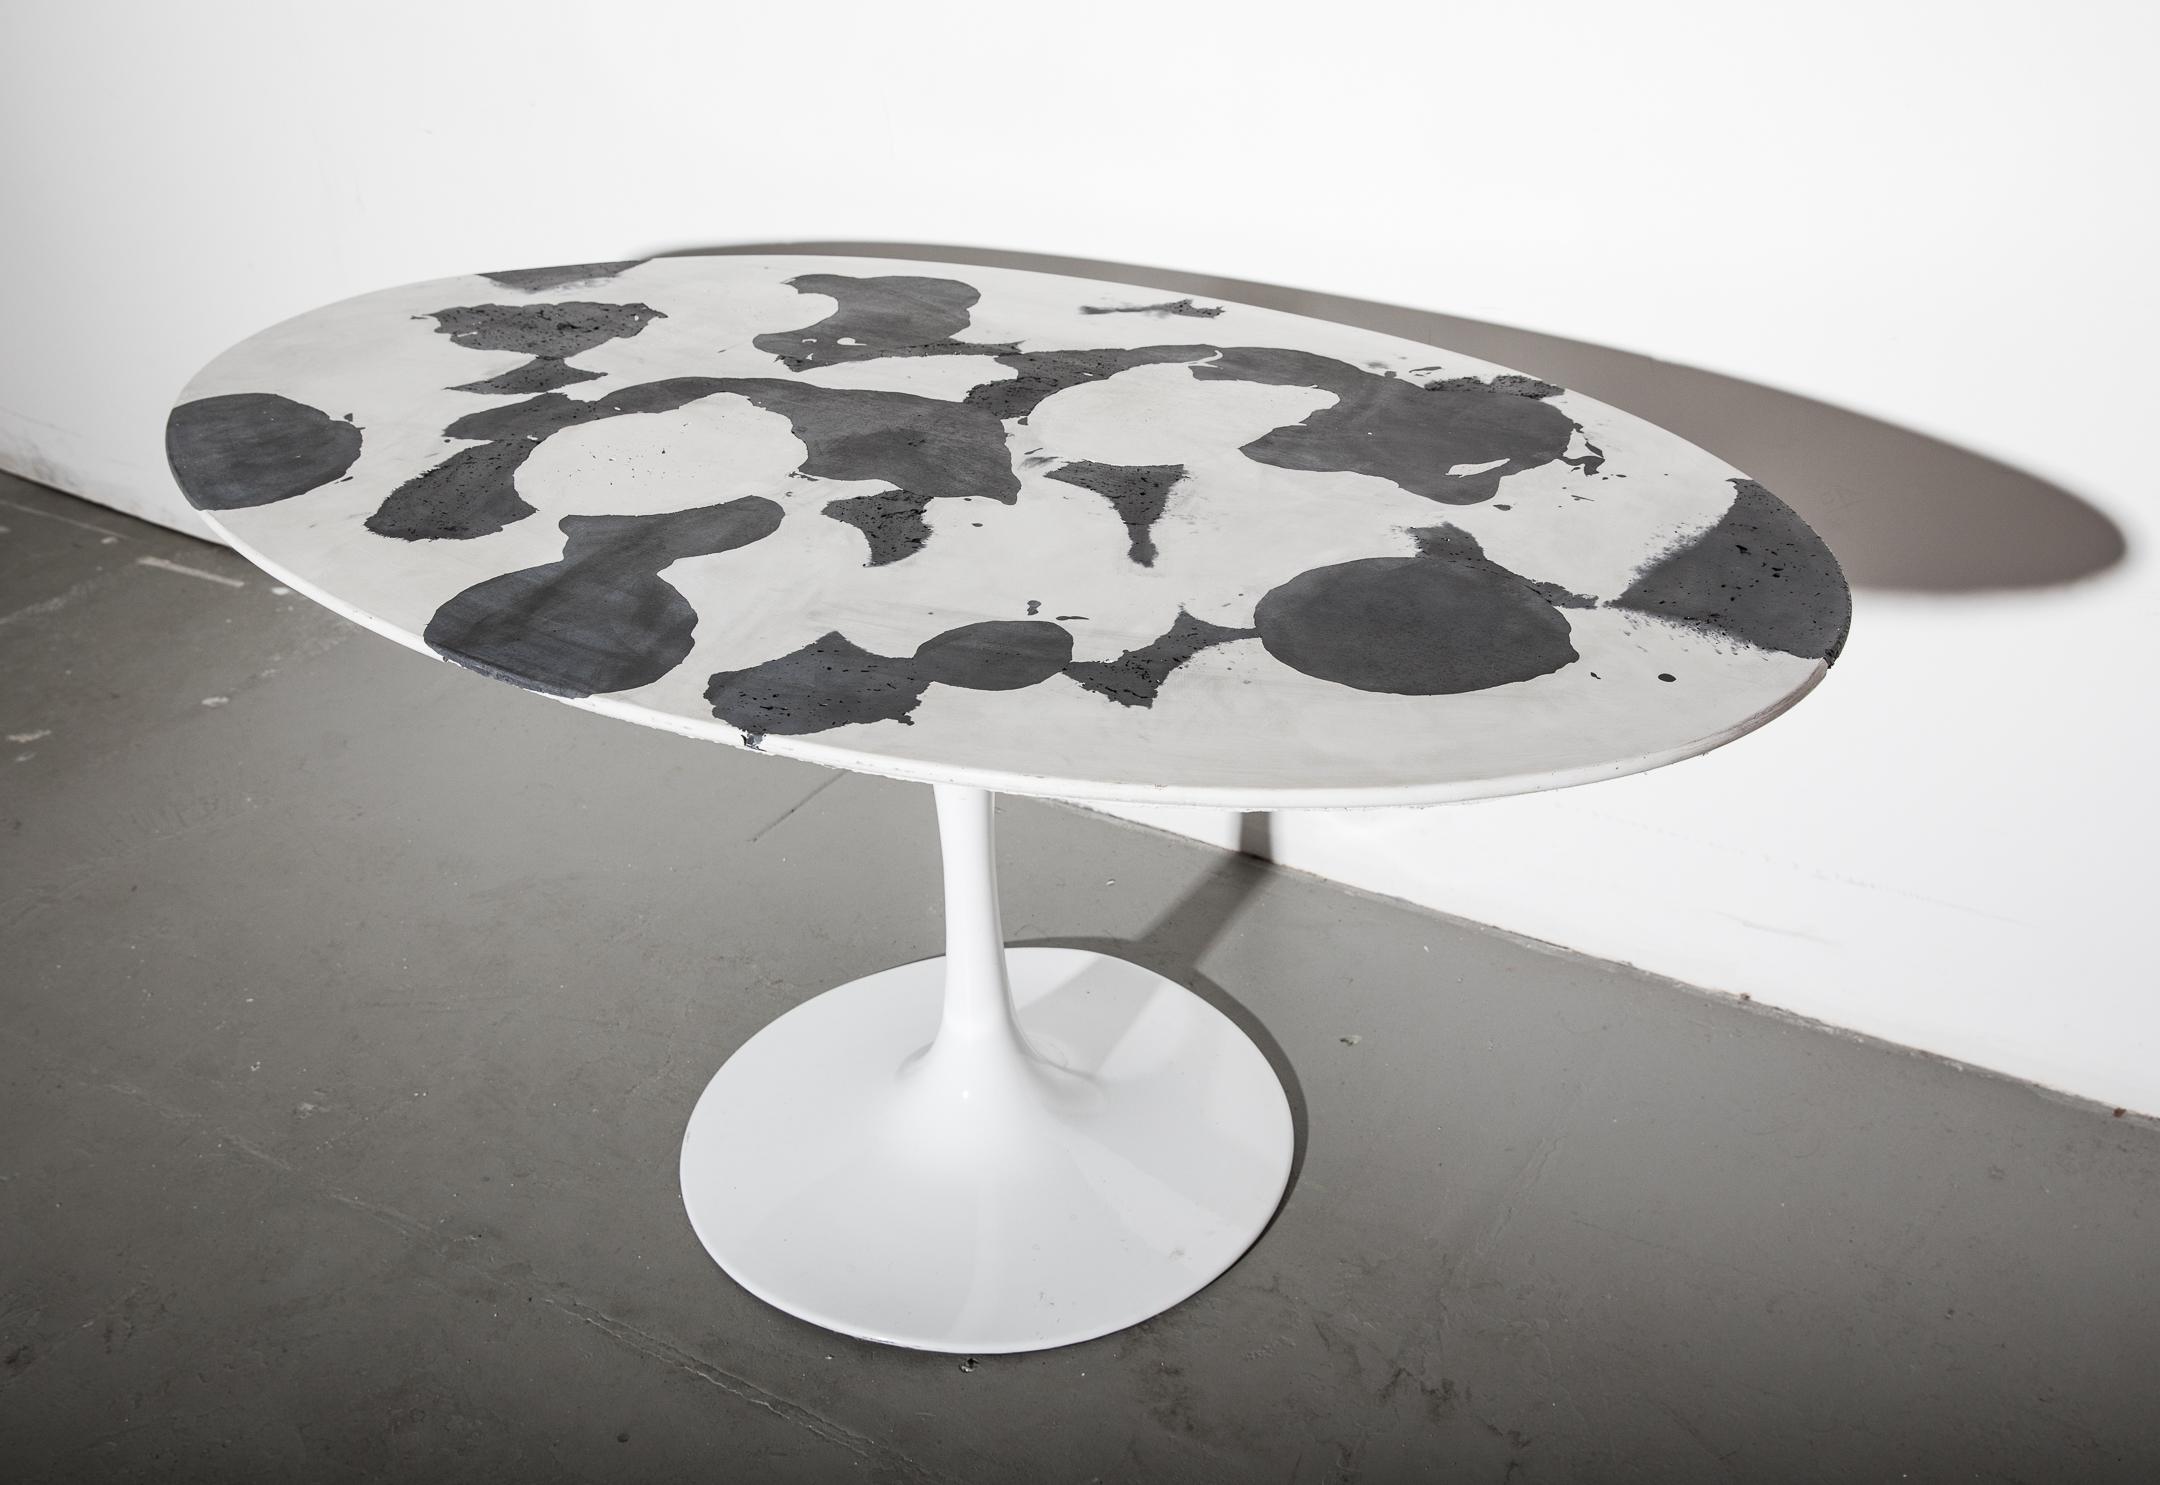 1_Patrick Cain Designs_Harvey Concrete Tulip Table_Cowhide.jpg